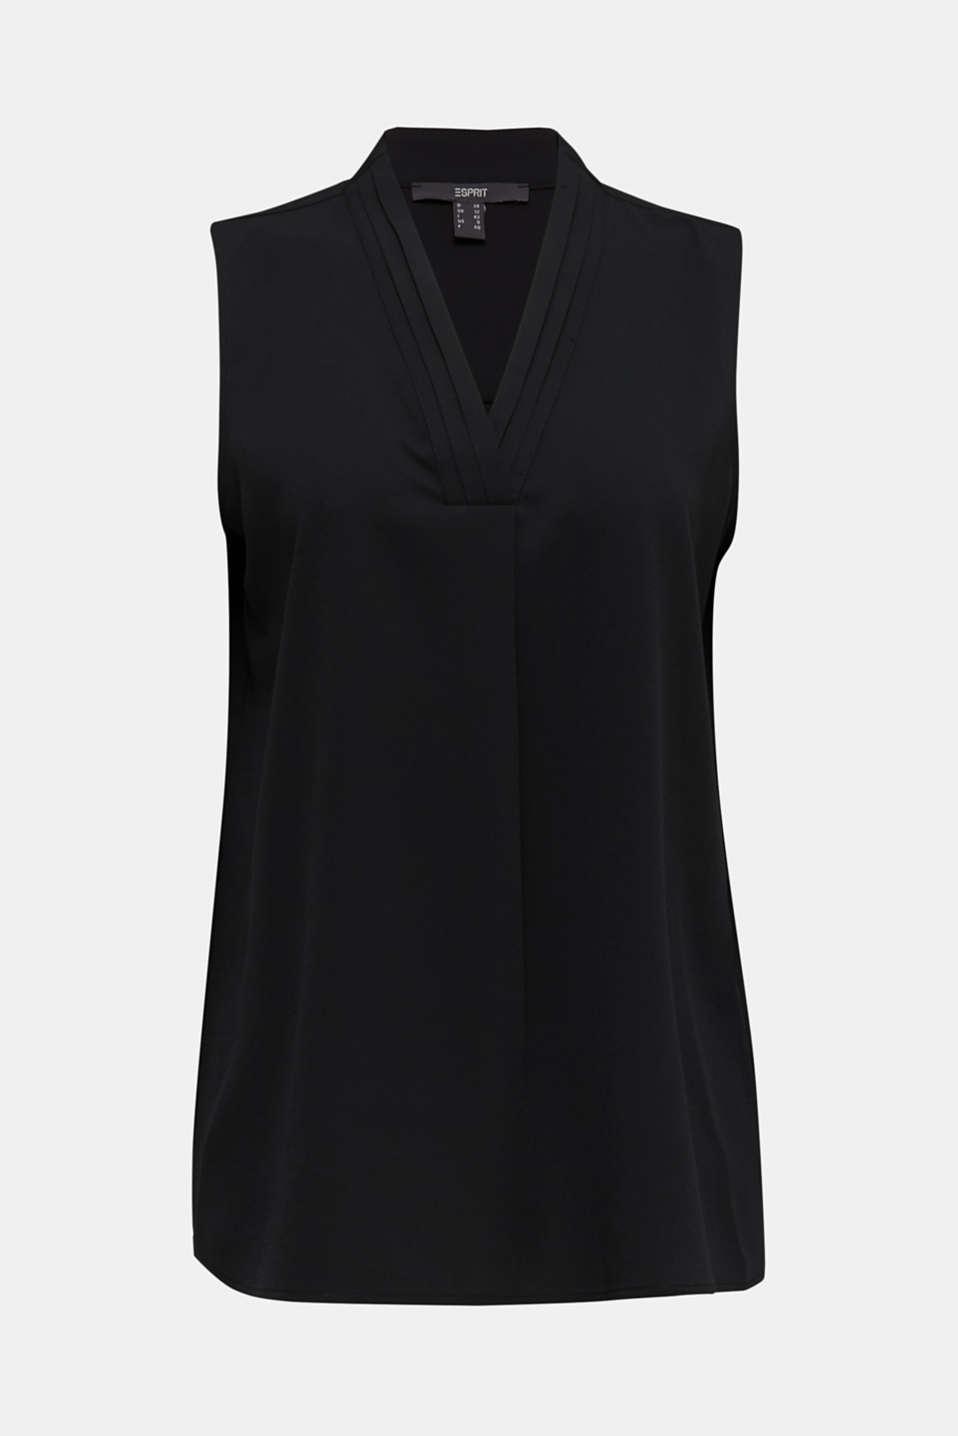 Recycled crêpe blouse top, BLACK, detail image number 6